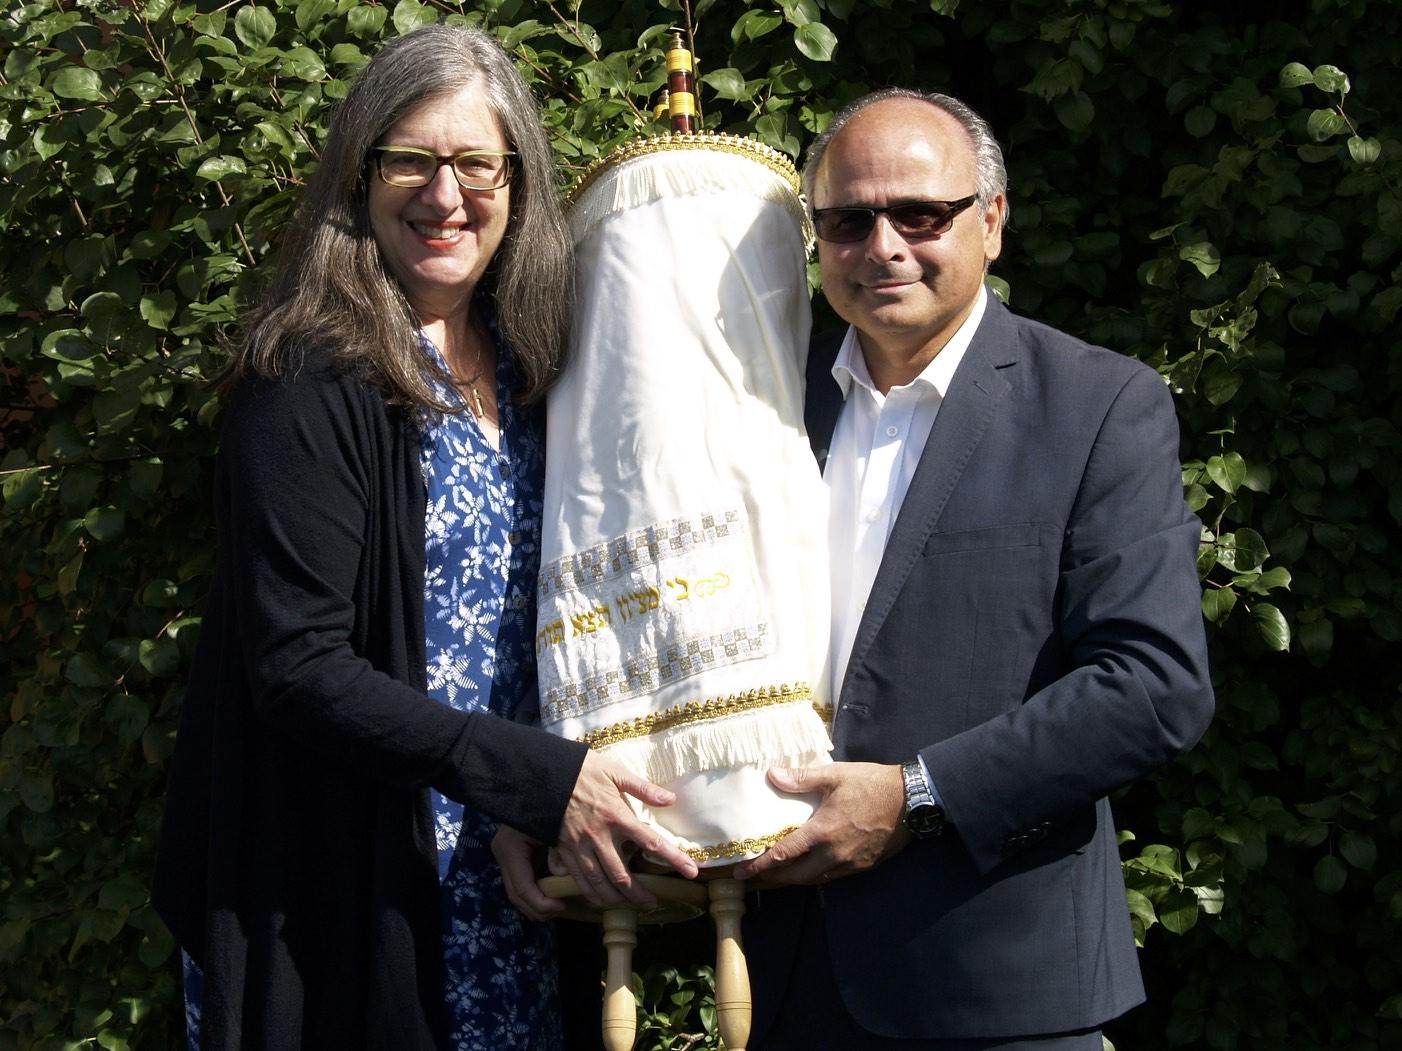 Rabbi Liz and Cantor Benlolo